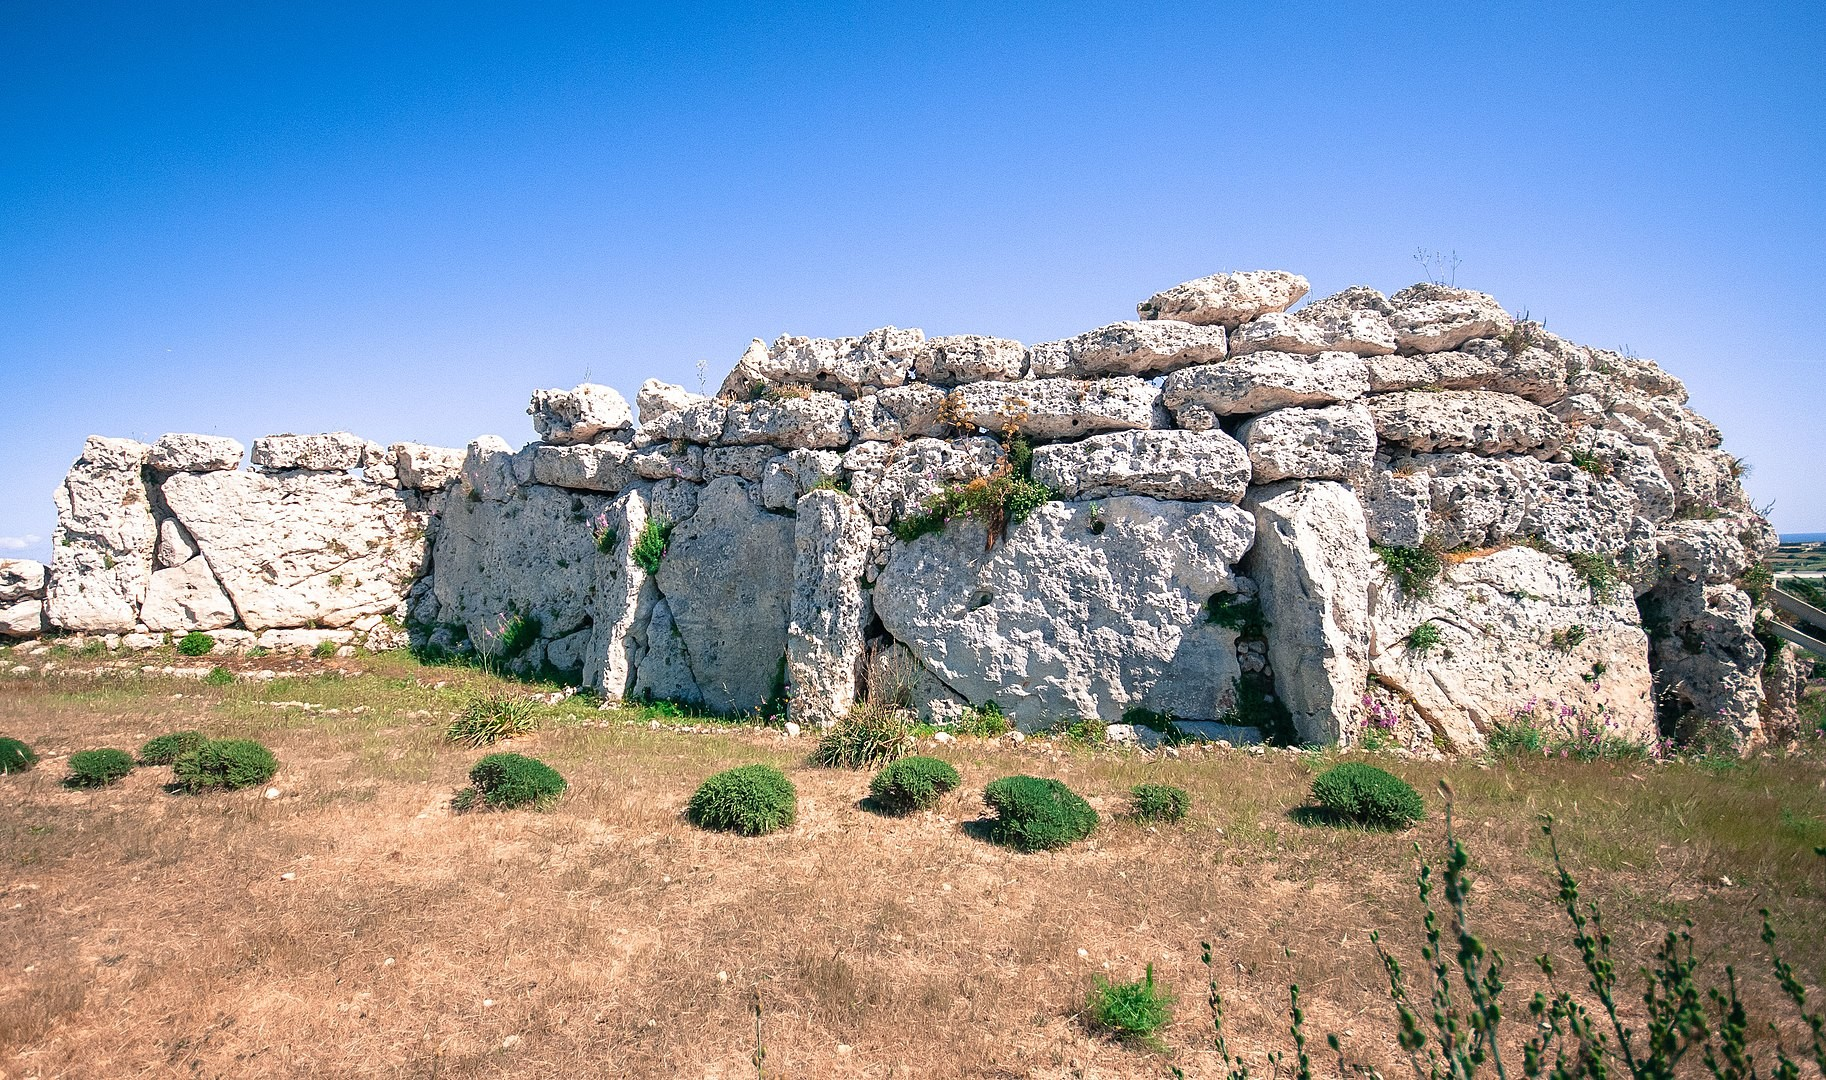 Ġgantija Megalithic Temples complex on Gozo in Malta.